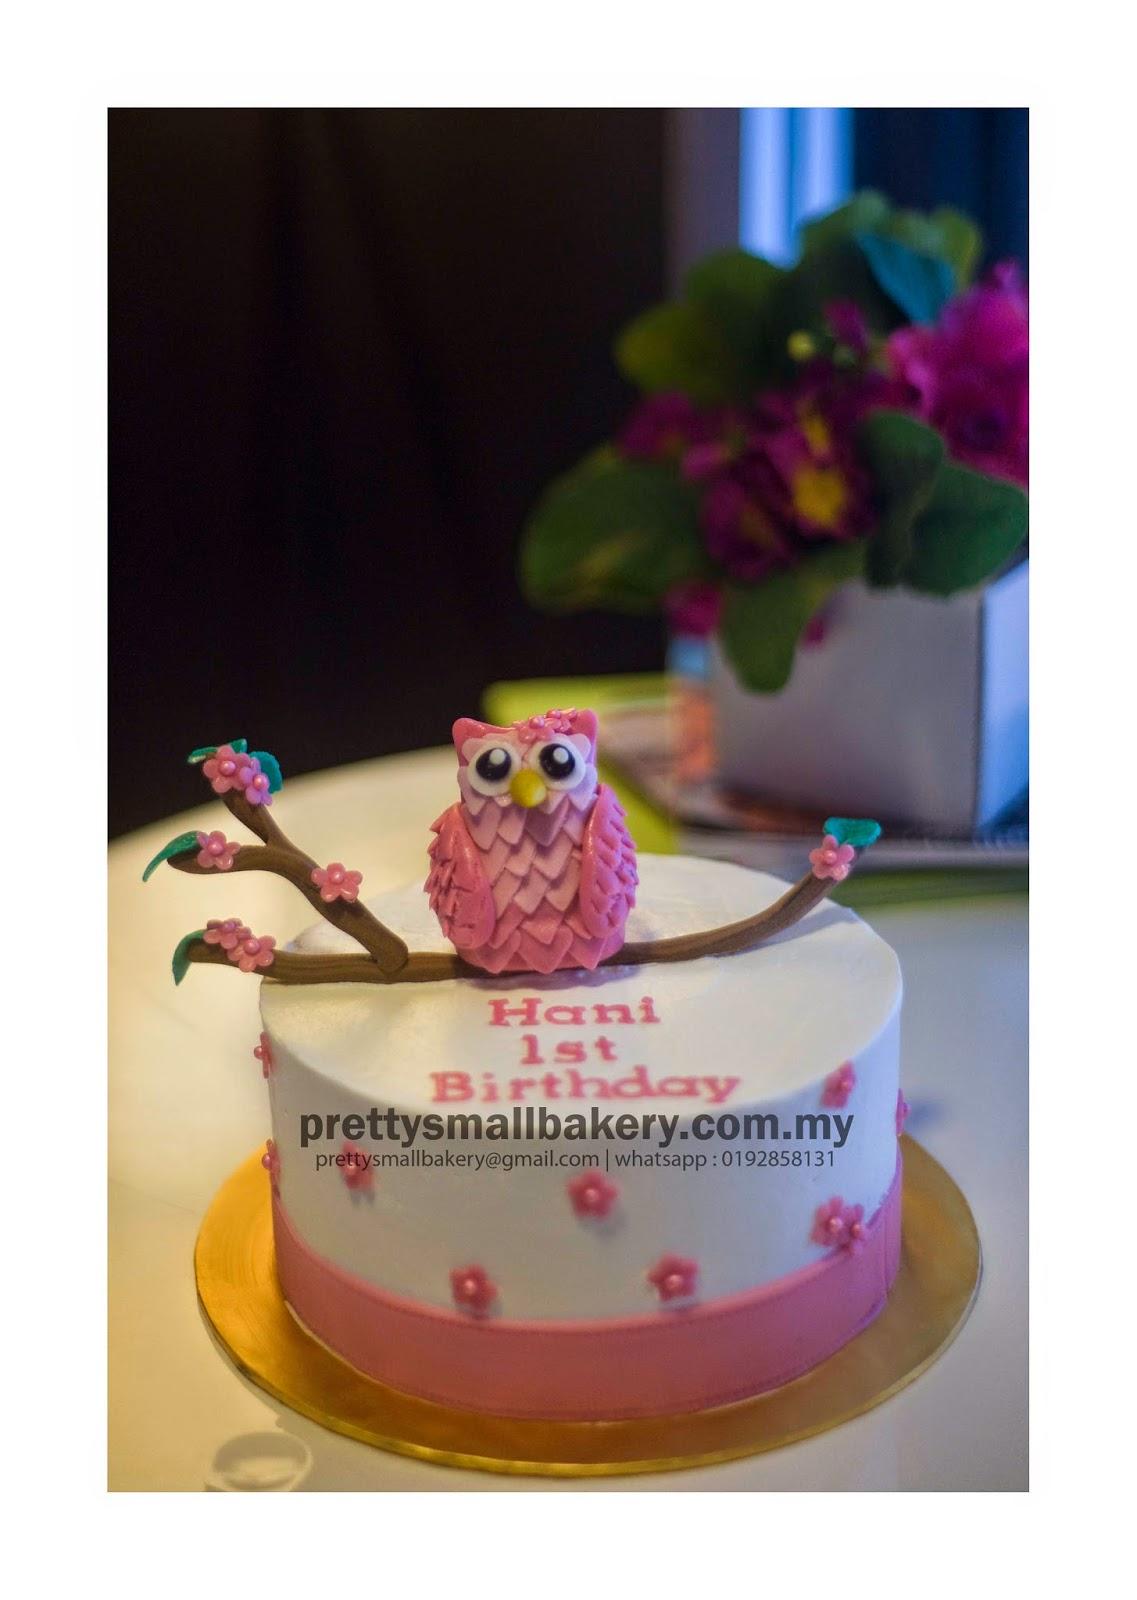 Kek Birthday Yang Paling Comel Prettysmallbakery